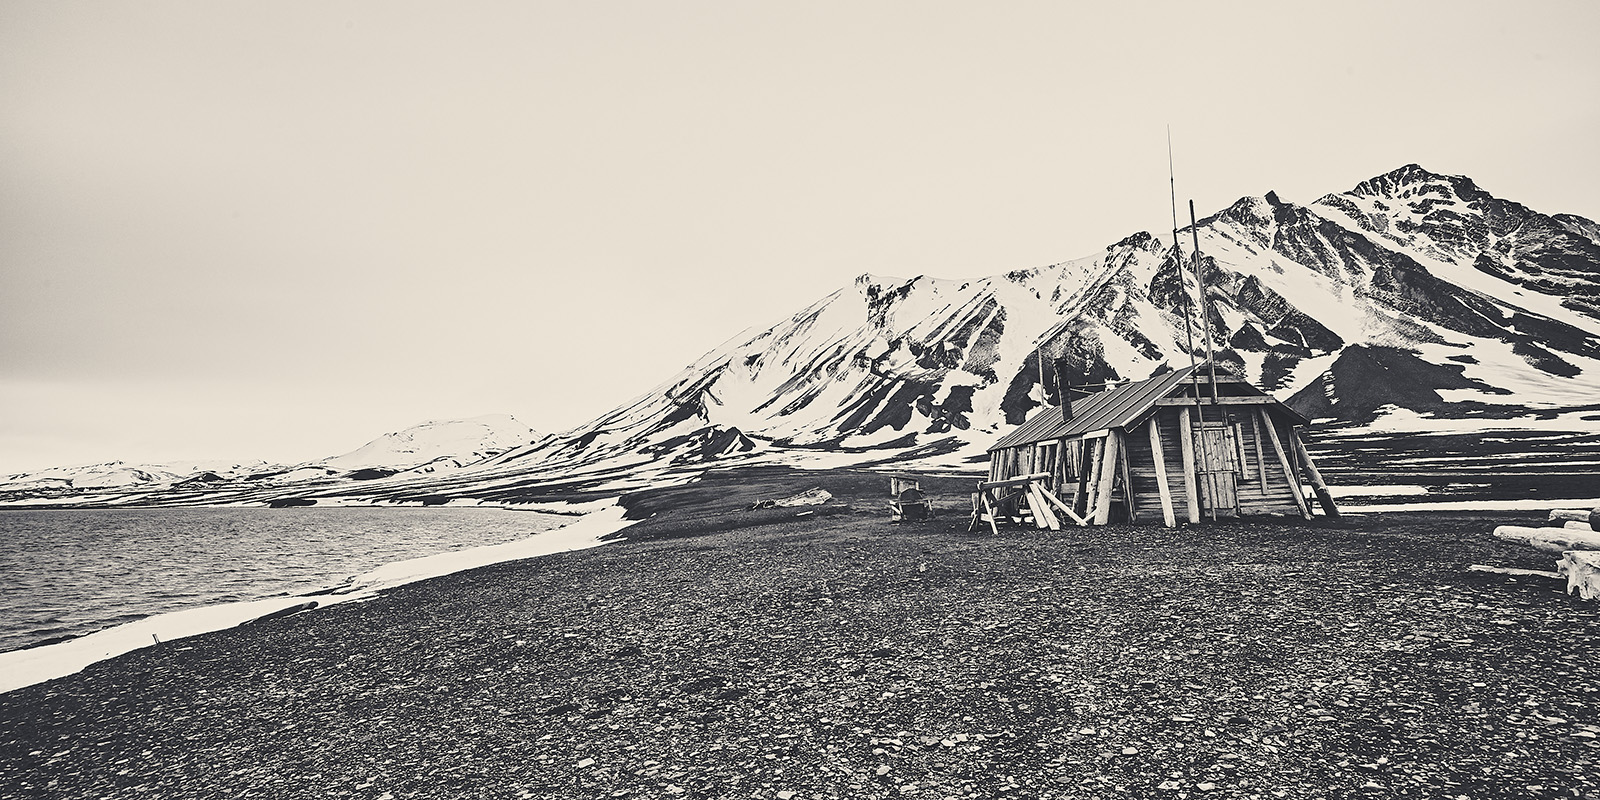 Fangsthytte på Svalbard av Peder Aaserud Eikeland